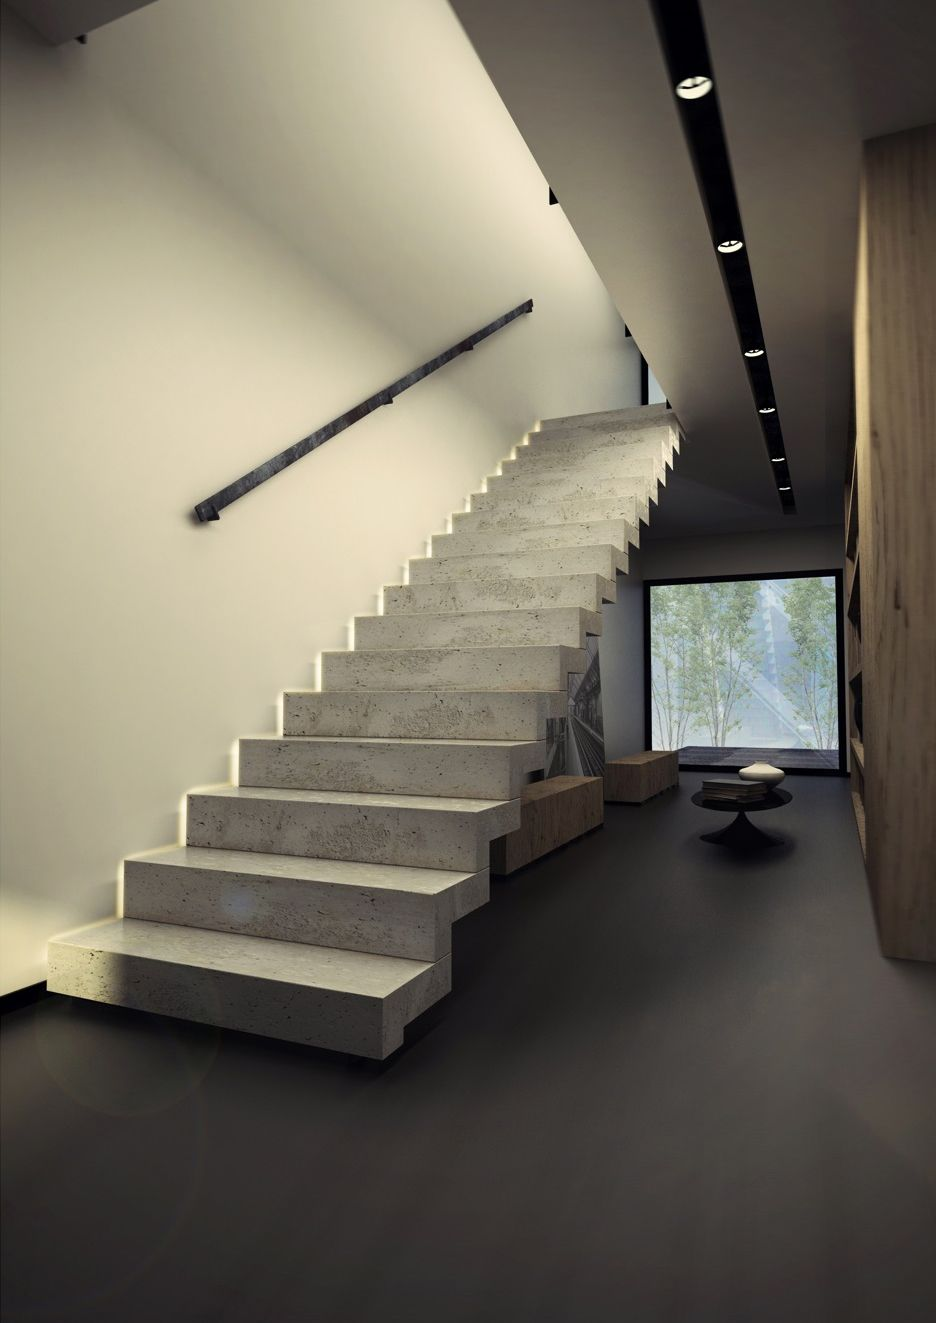 Escalier konkret krt001 lighting escalier beton beton - Escalier contemporain beton ...